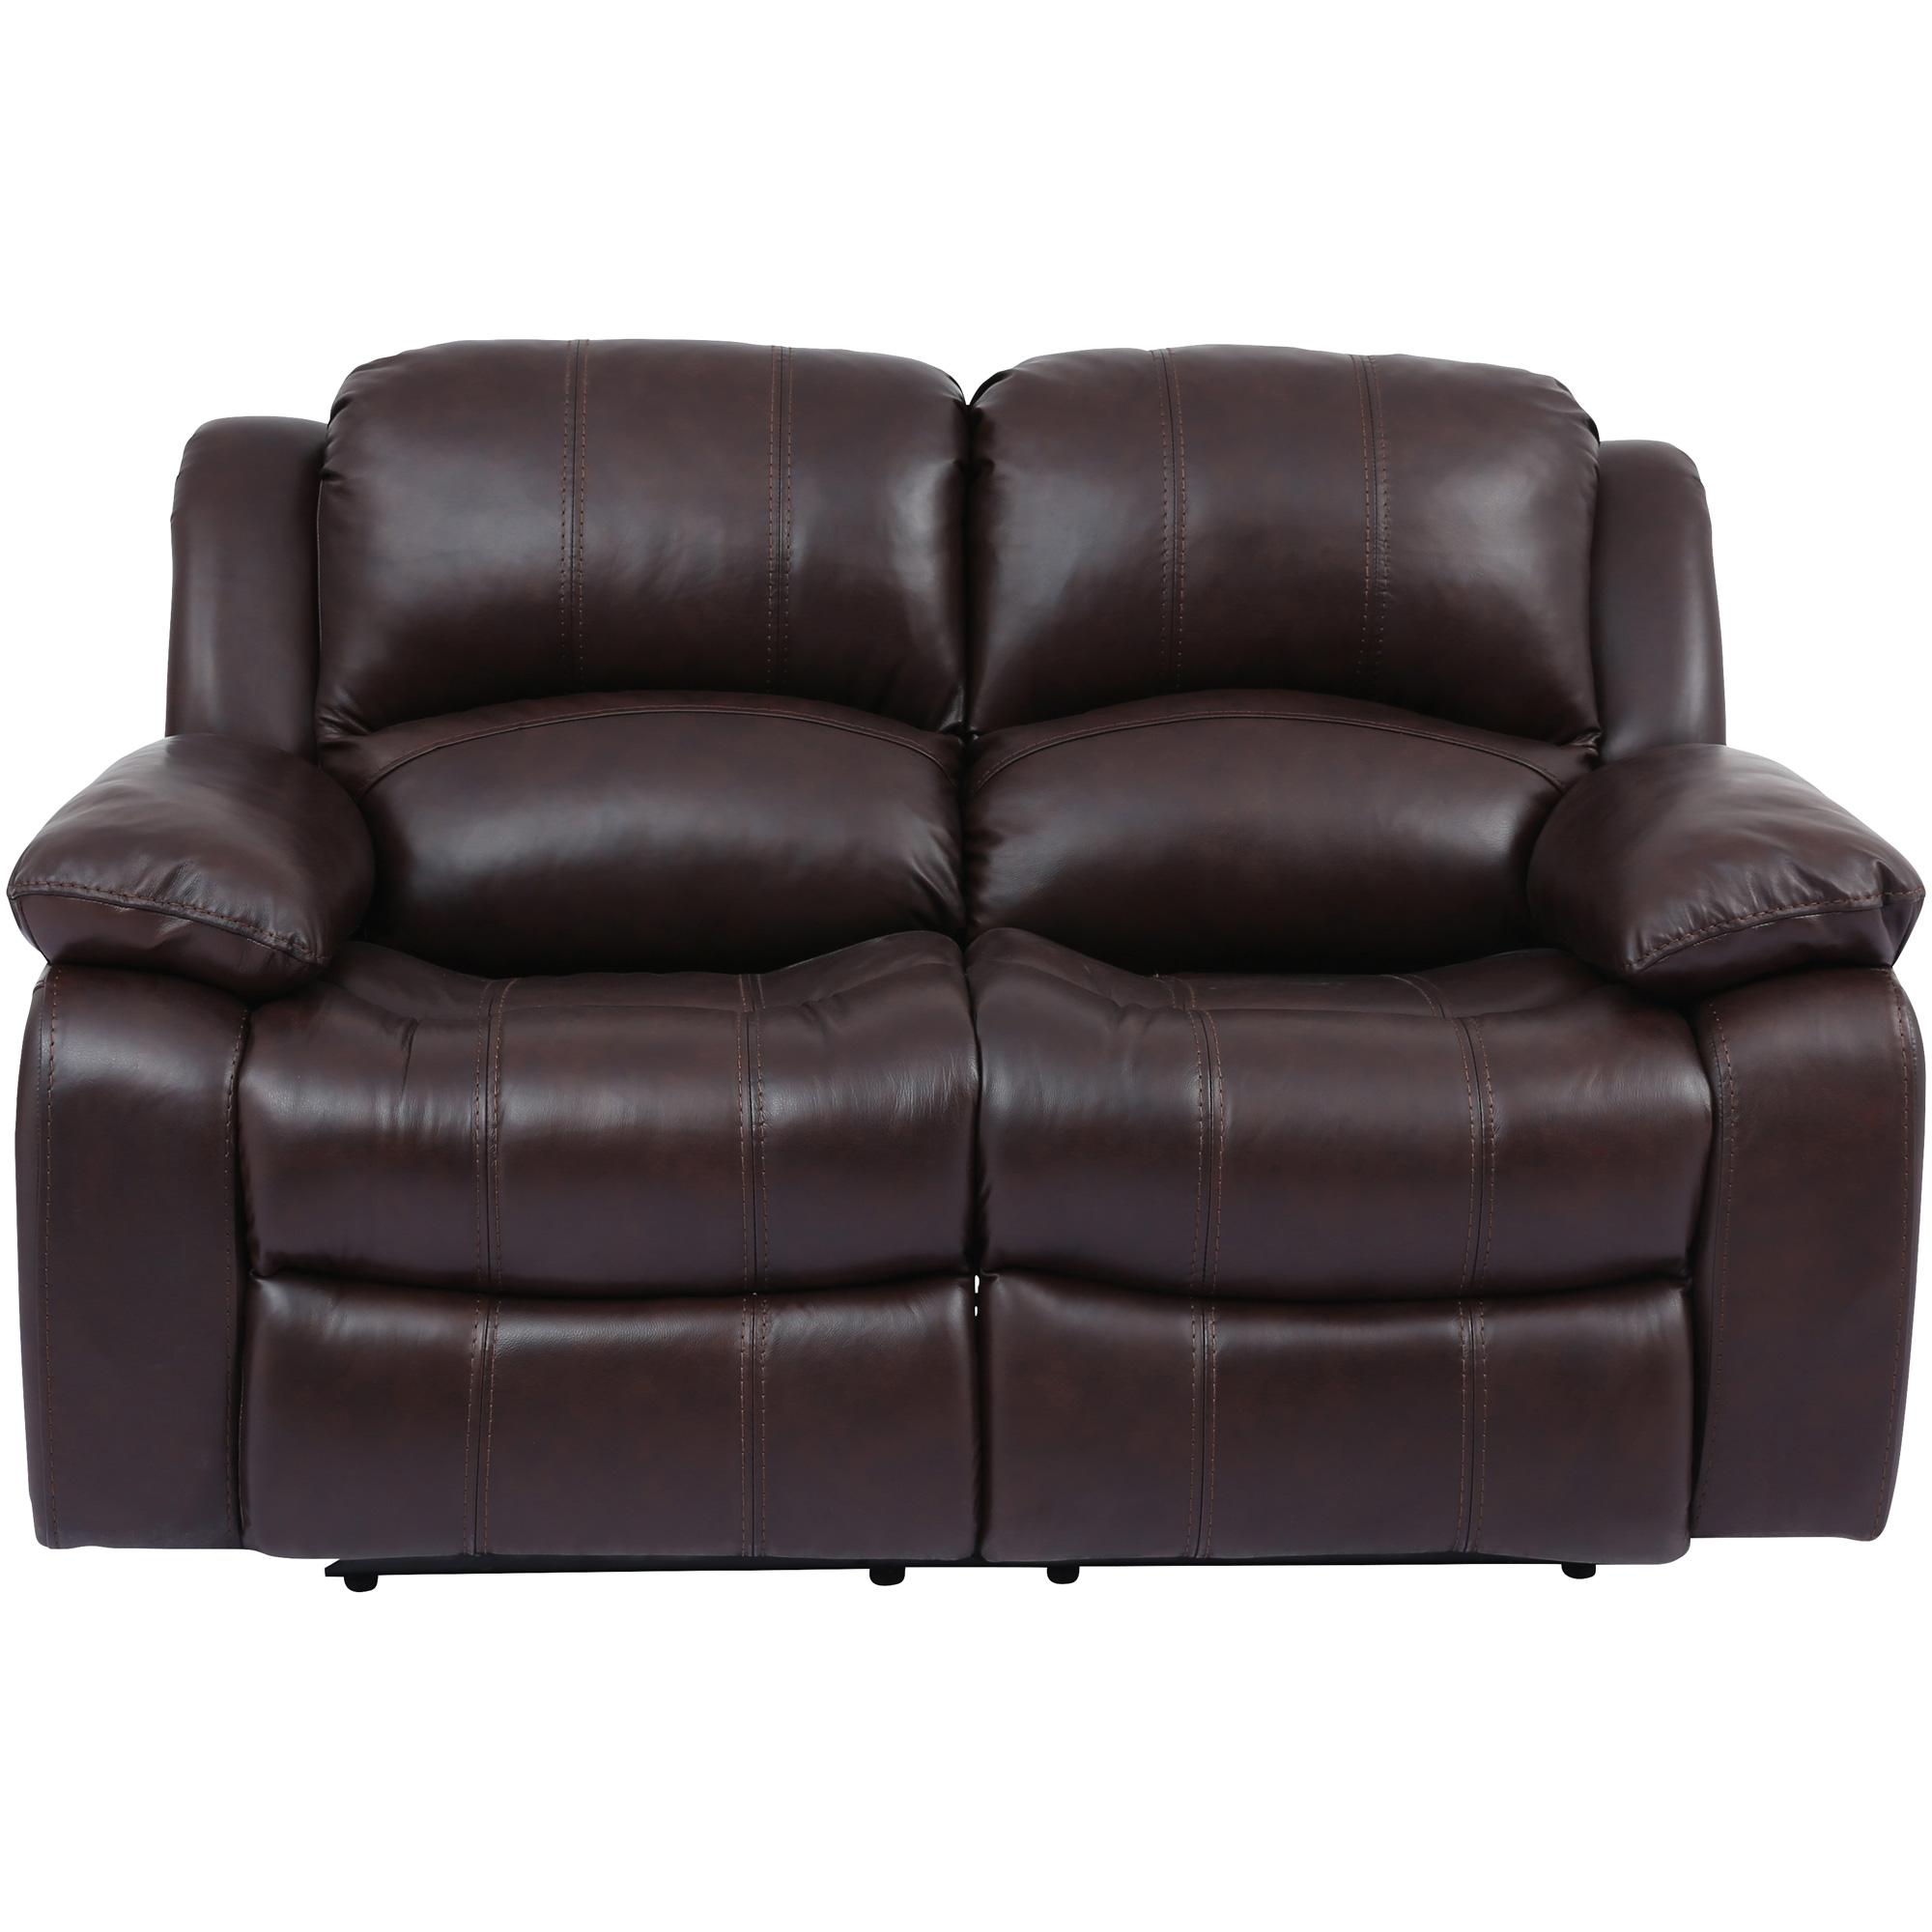 Wah Cheers | Ender Brown Leather Power+ Reclining Loveseat Sofa